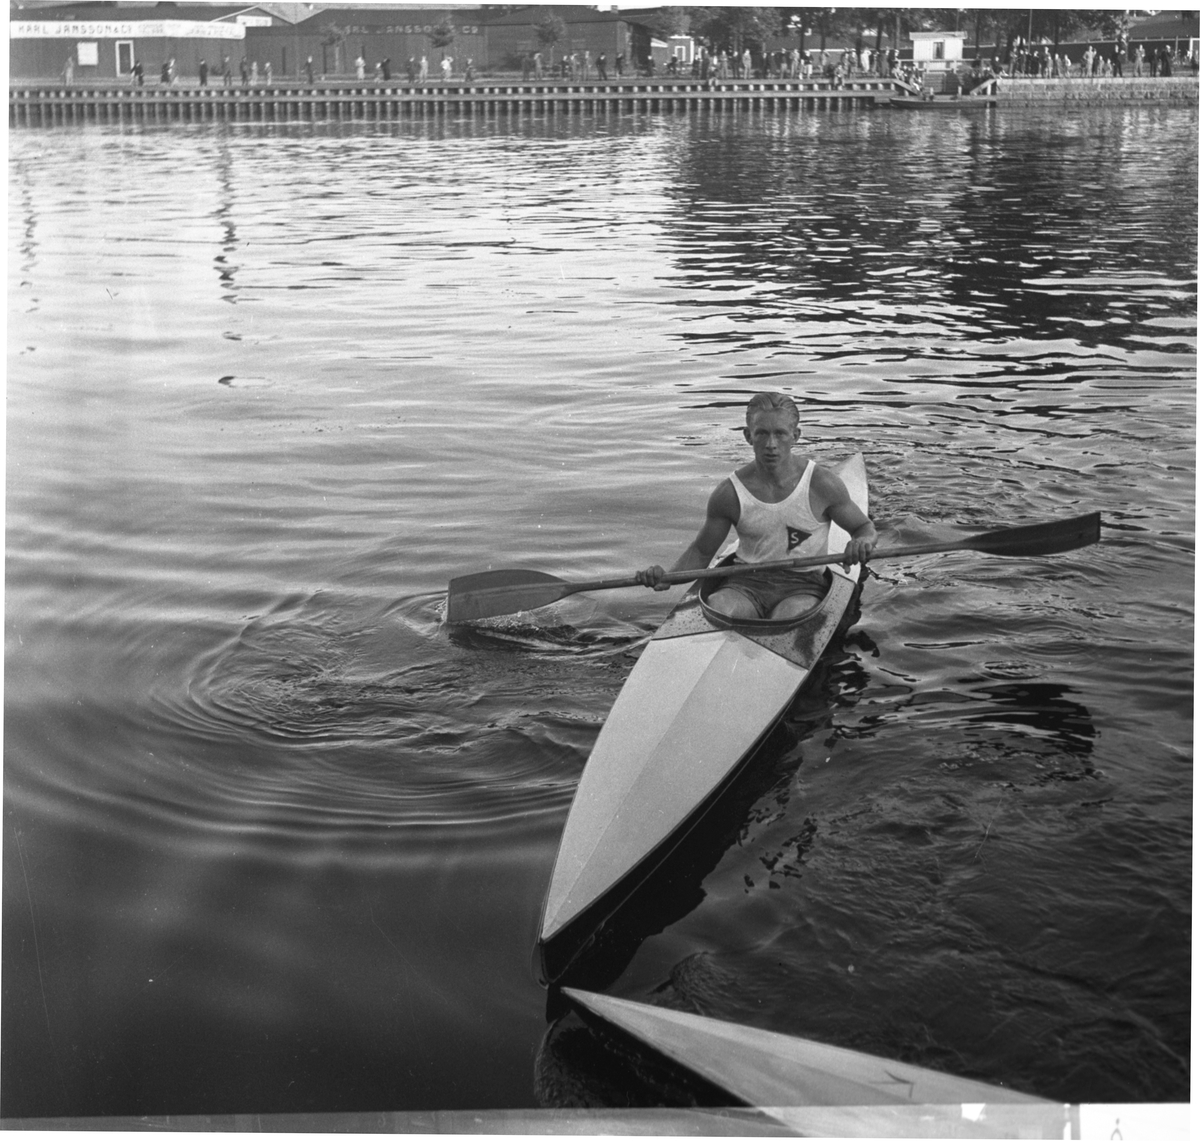 Kanotpaddling. 1942